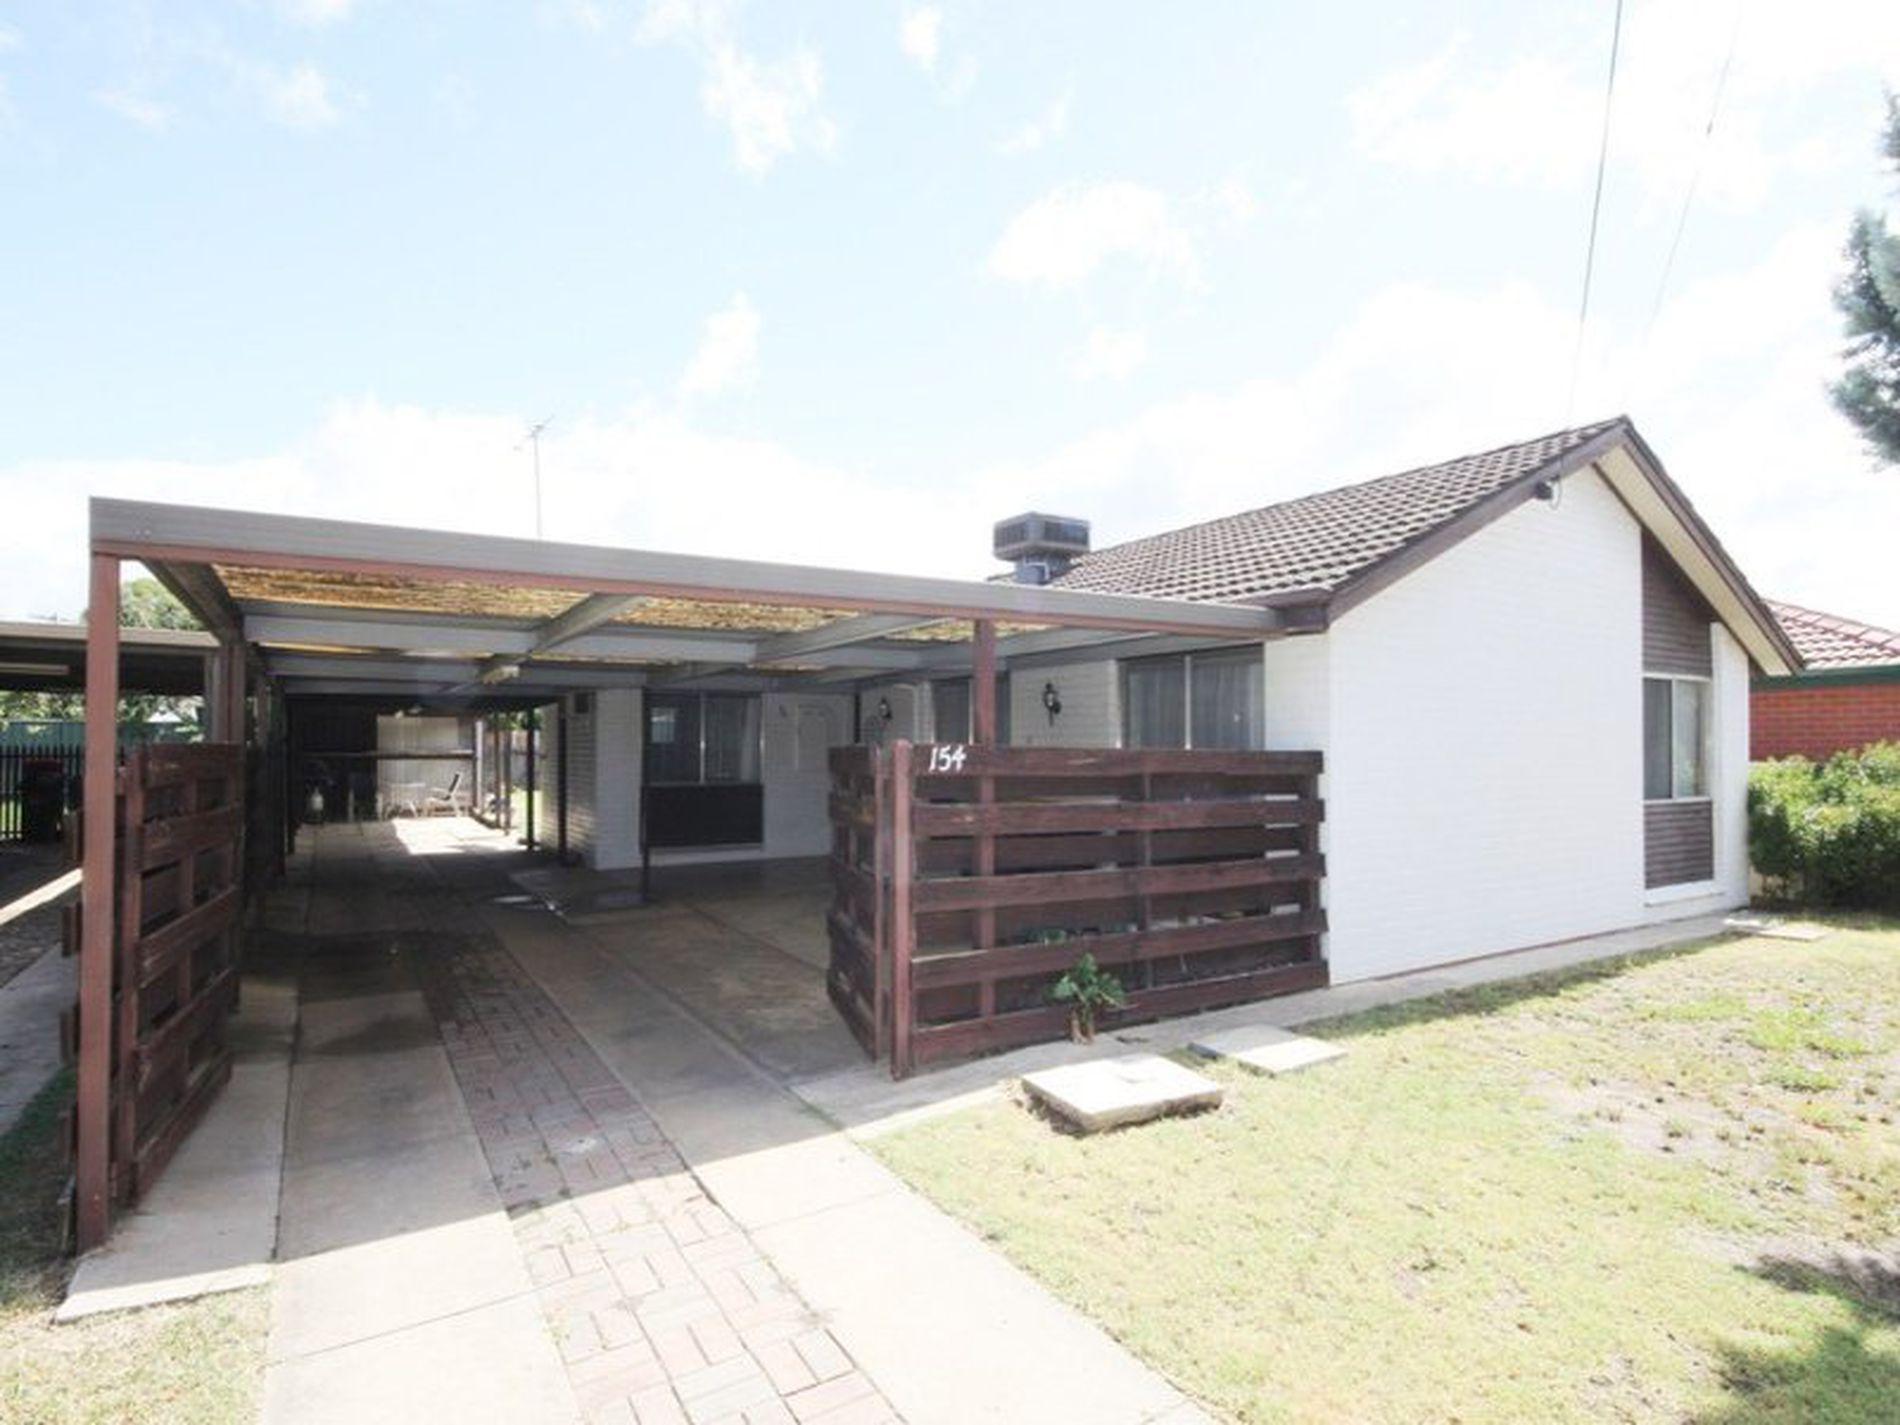 154 Murdoch Road, Wangaratta